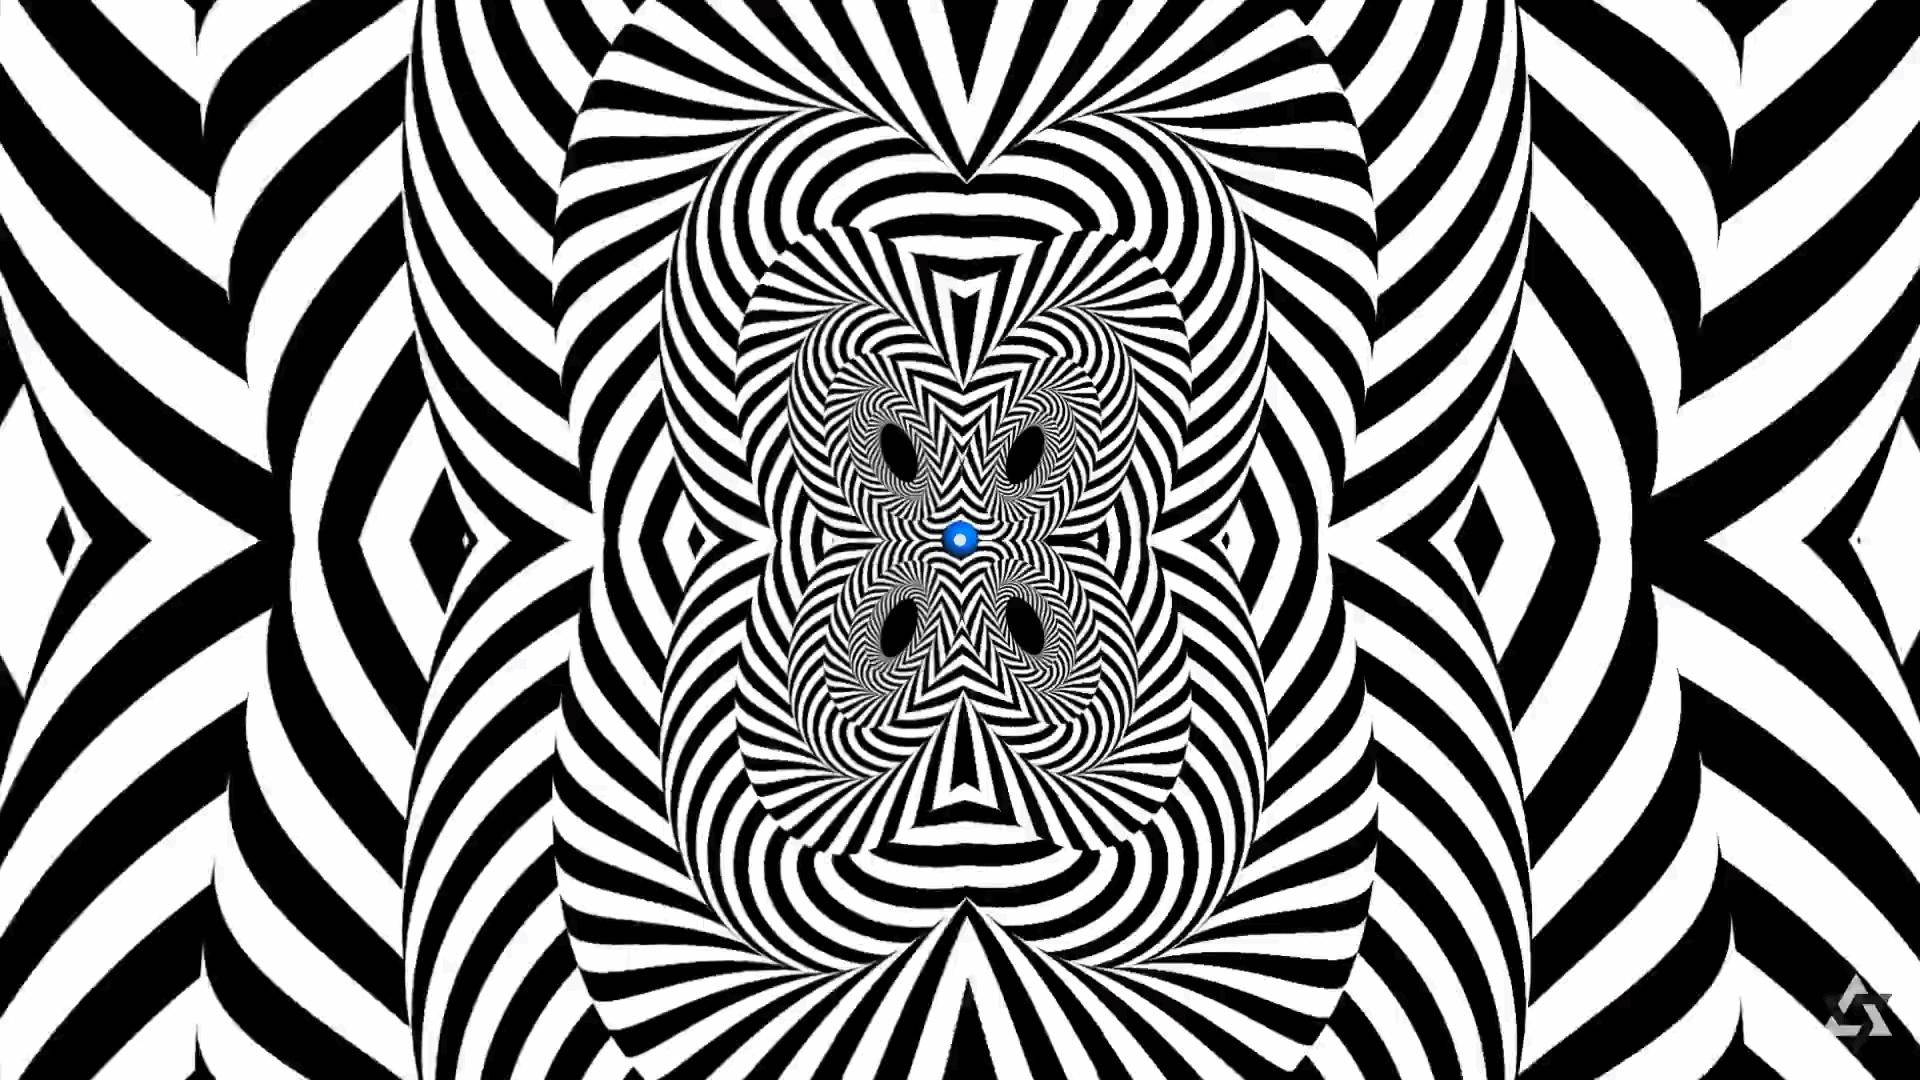 Illusion wallpaper photo hd